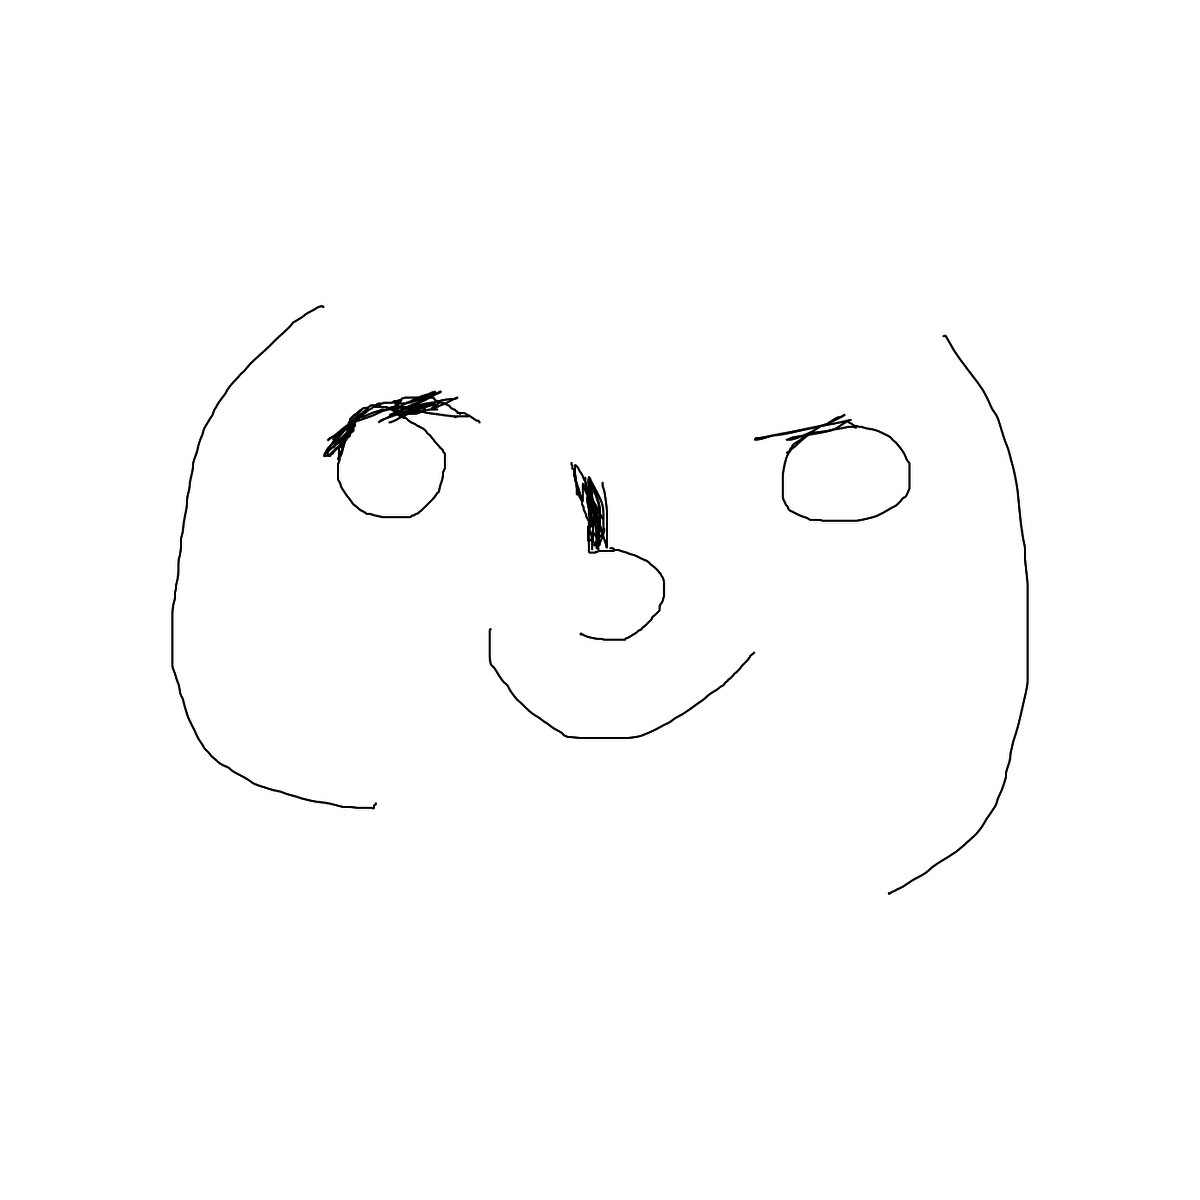 BAAAM drawing#1592 lat:50.9455986022949200lng: 21.4025611877441400